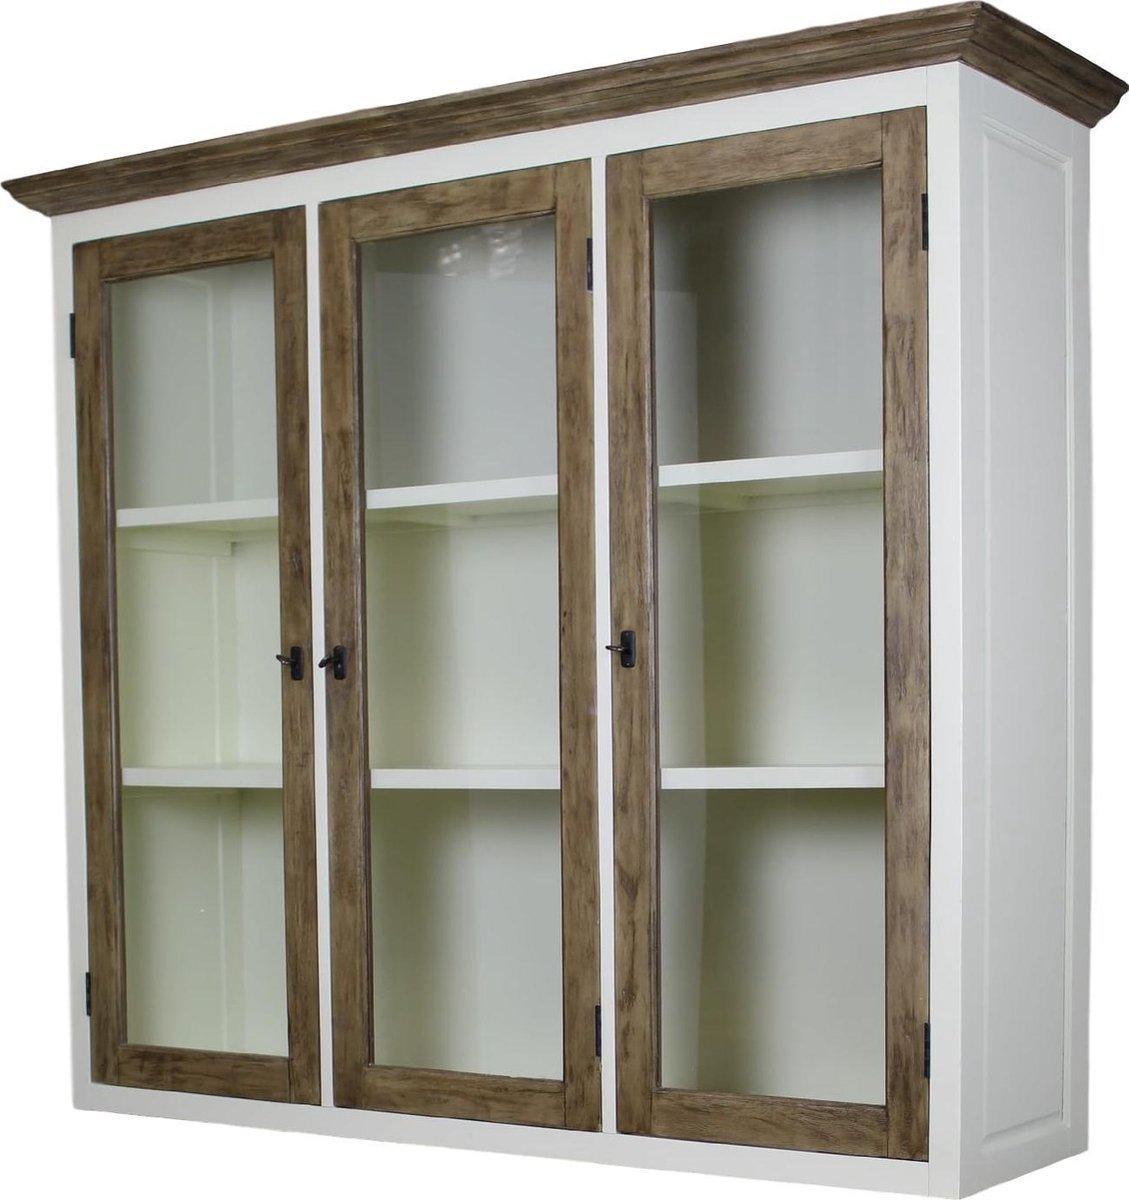 Super bol.com | HSM Collection - Bovenkast Hampshire 3-deurs - wit/oud TW-13